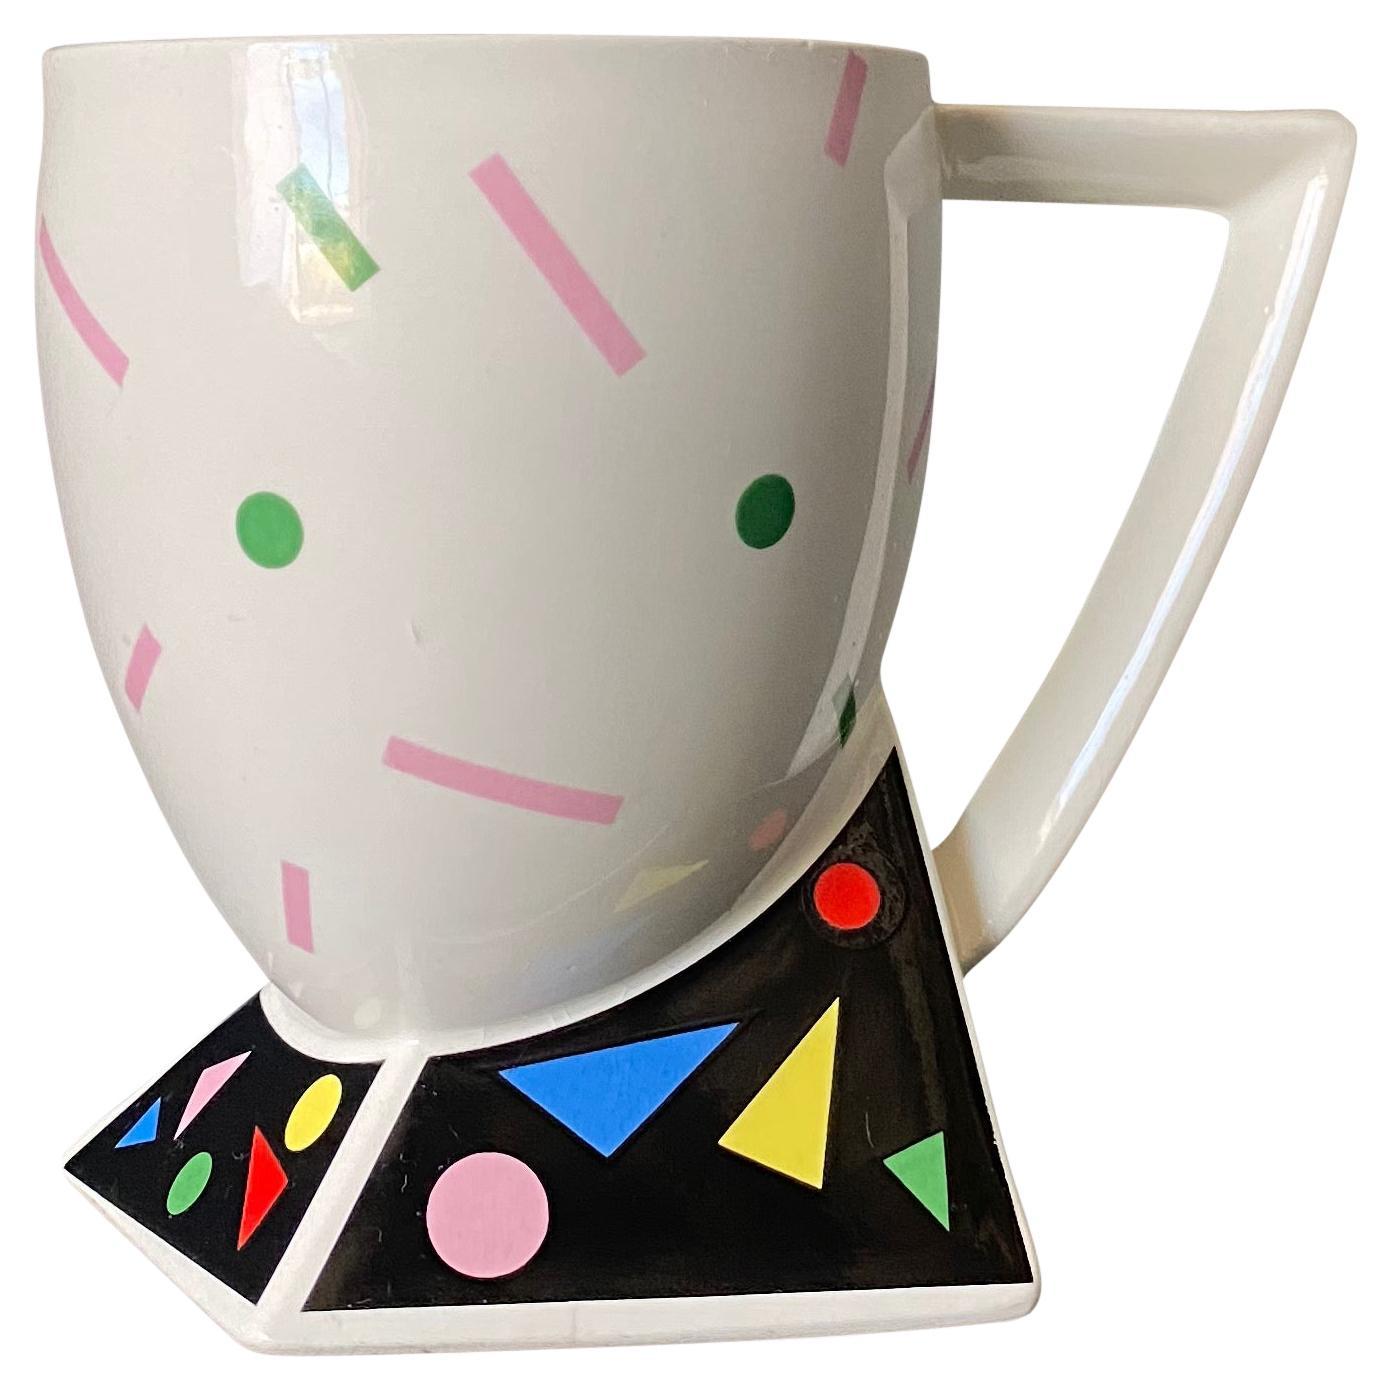 Kato Kogei Fujimori Collection Postmodern Mug, circa 1980